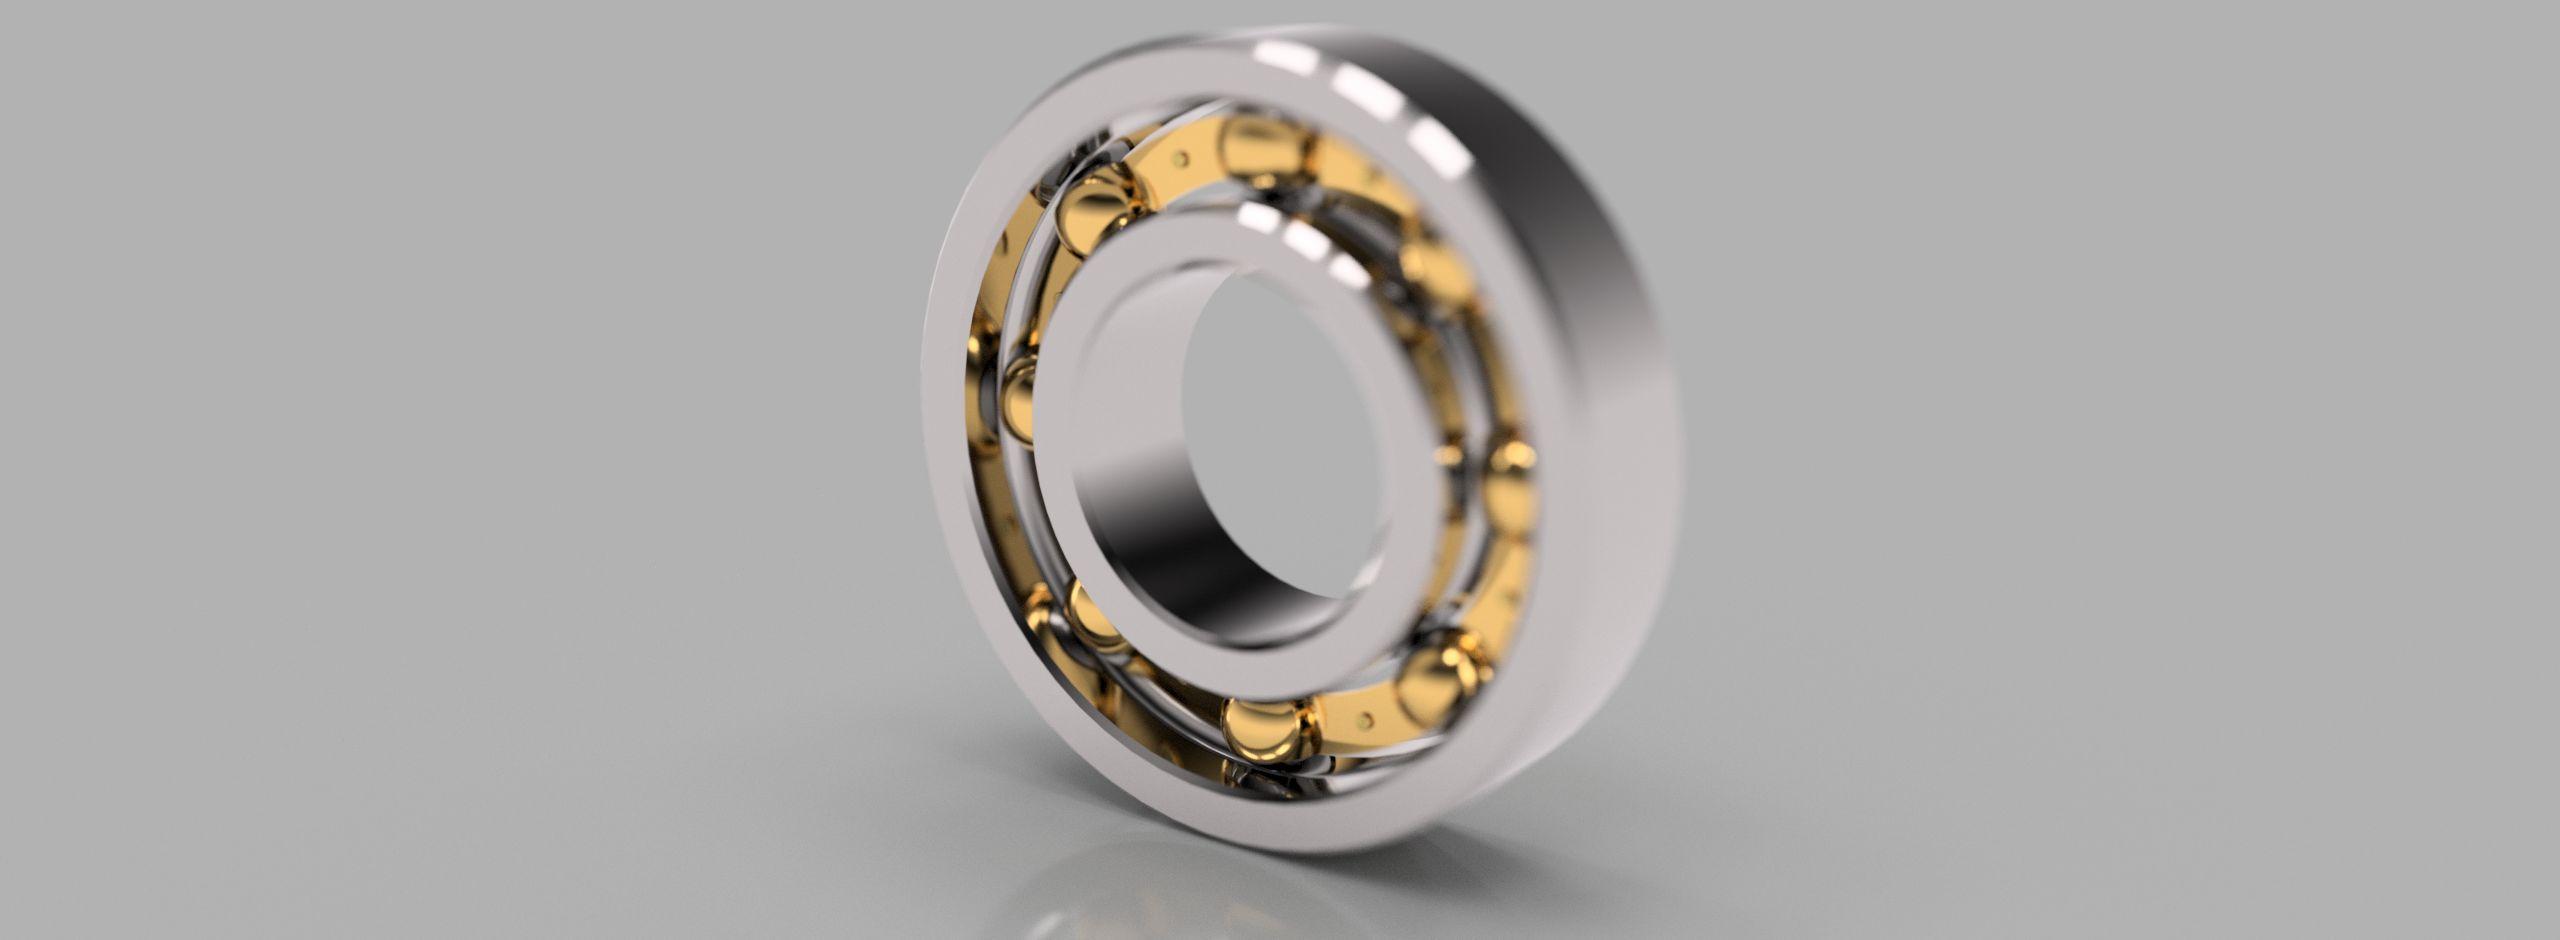 Ball-bearing-v2c-3500-3500